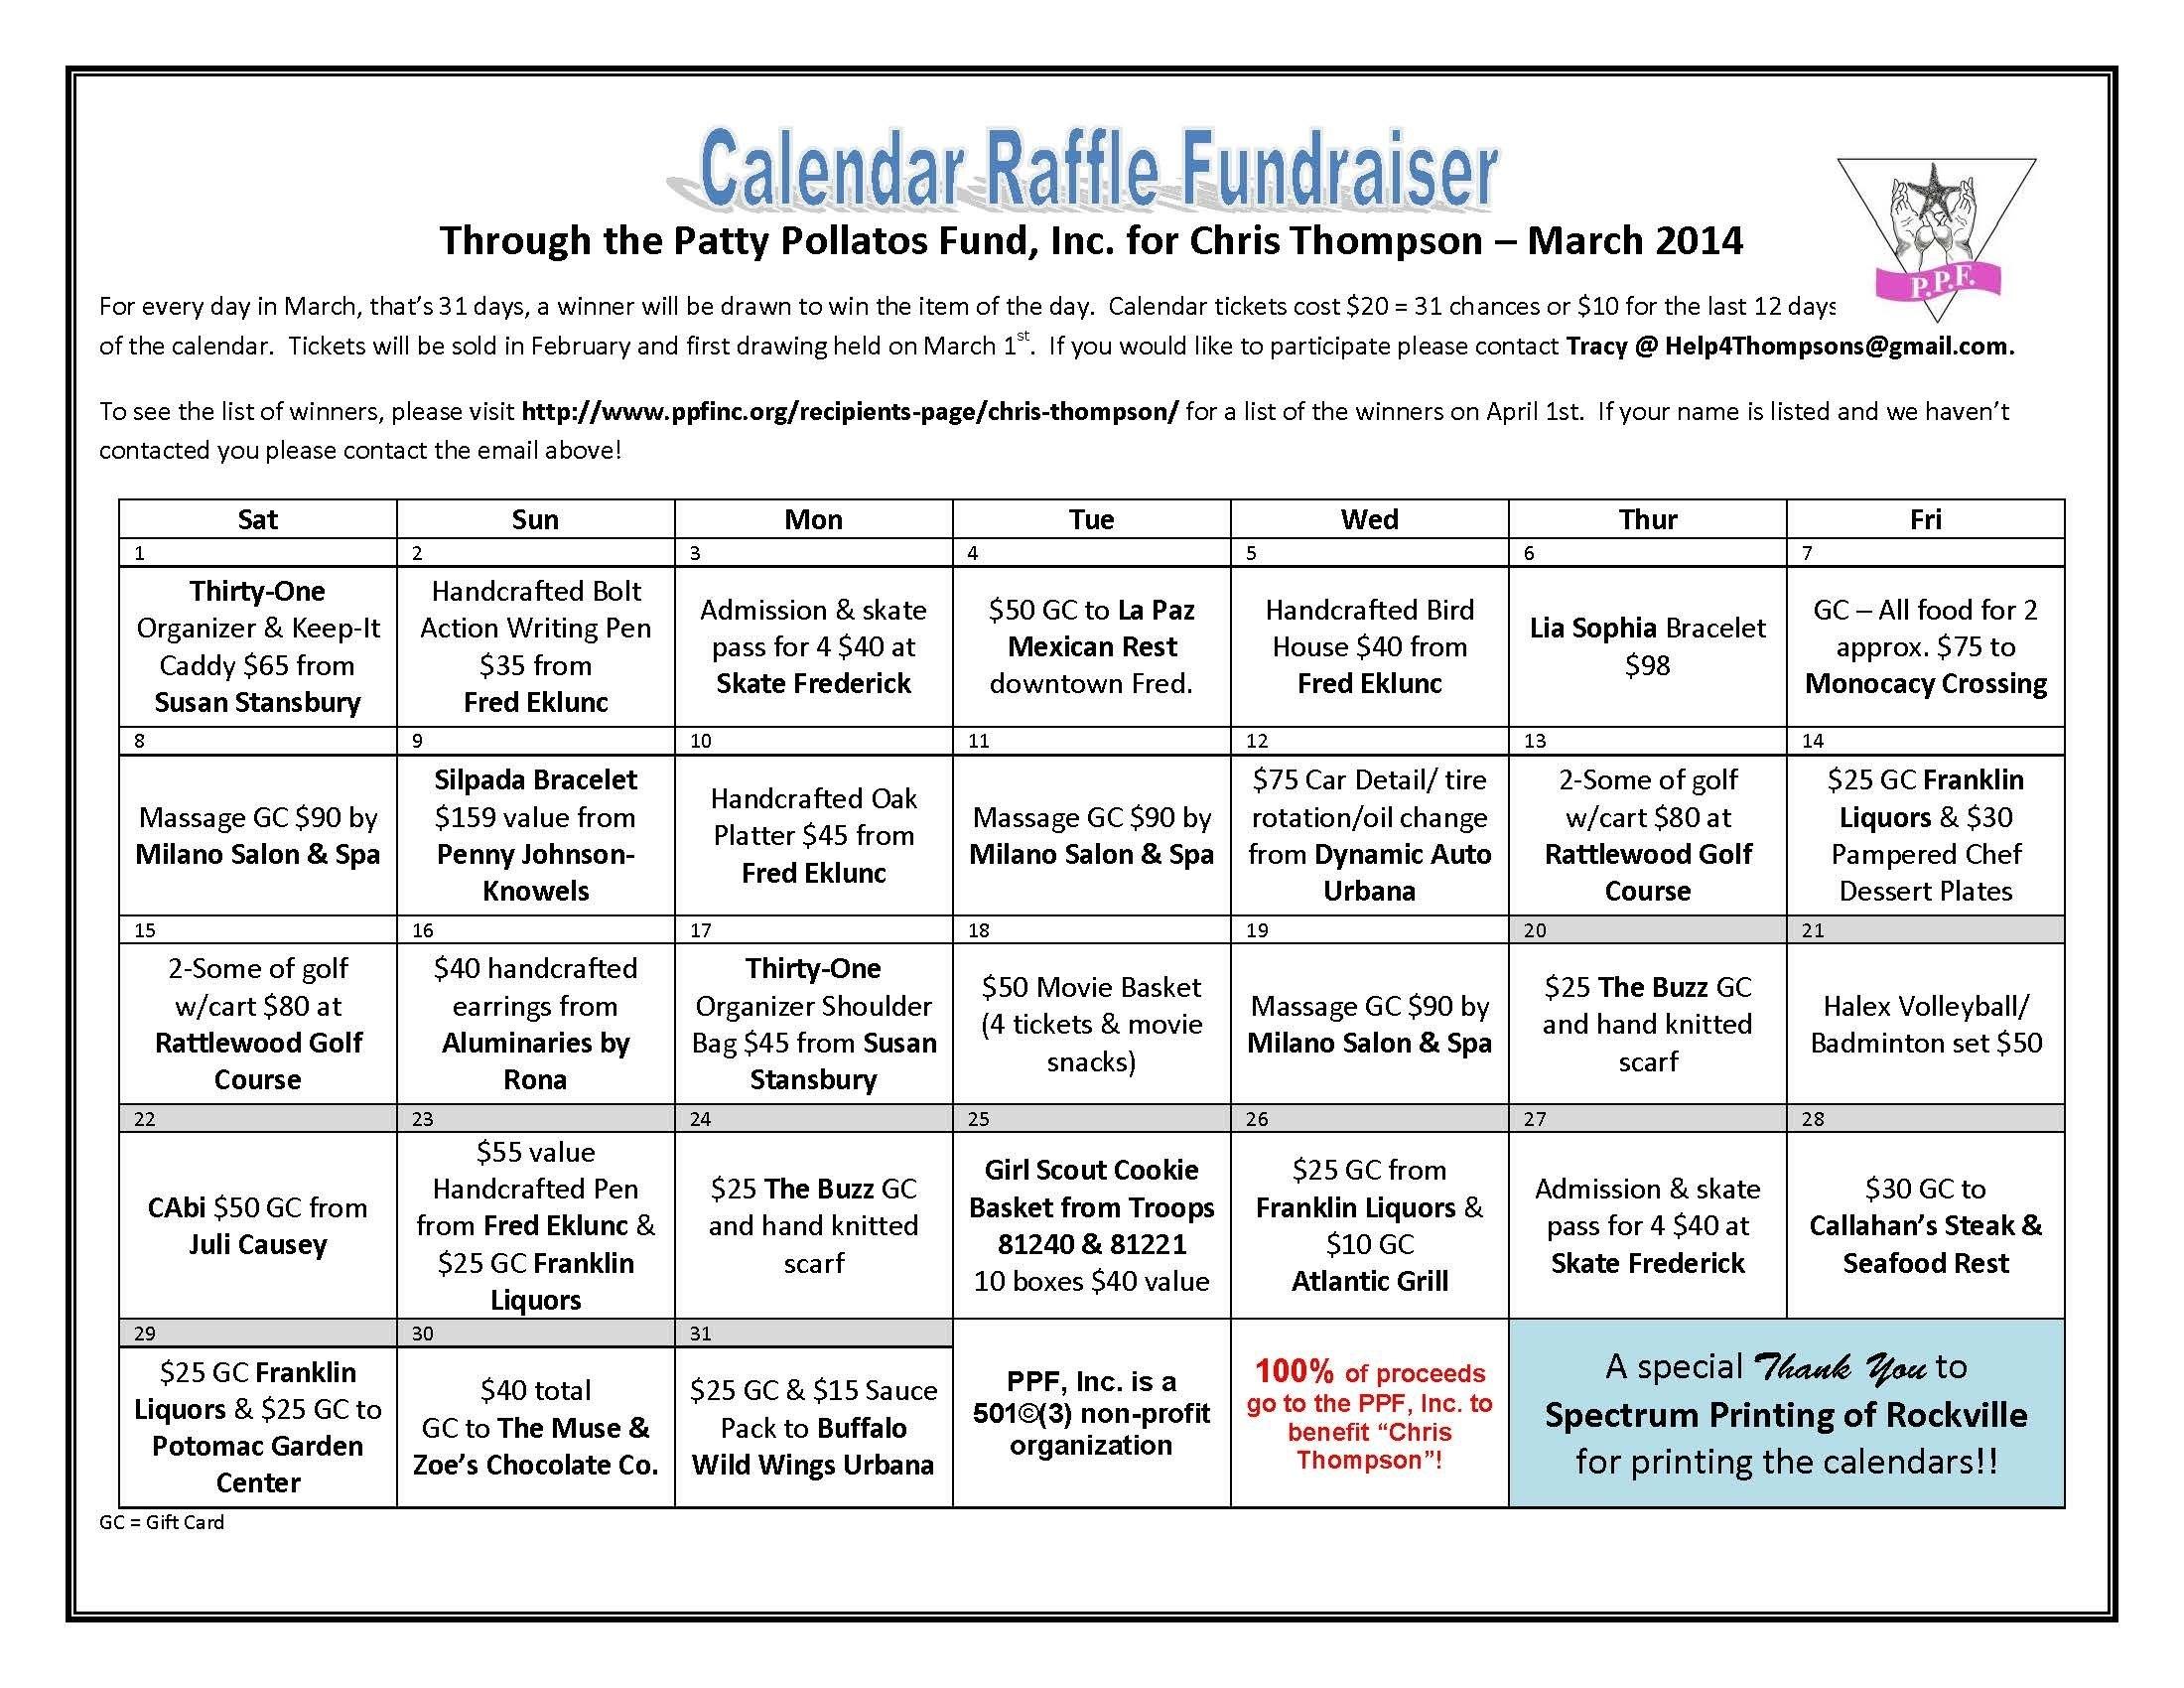 Chris Thompson Calendar Raffle (With Images) | Fundraising